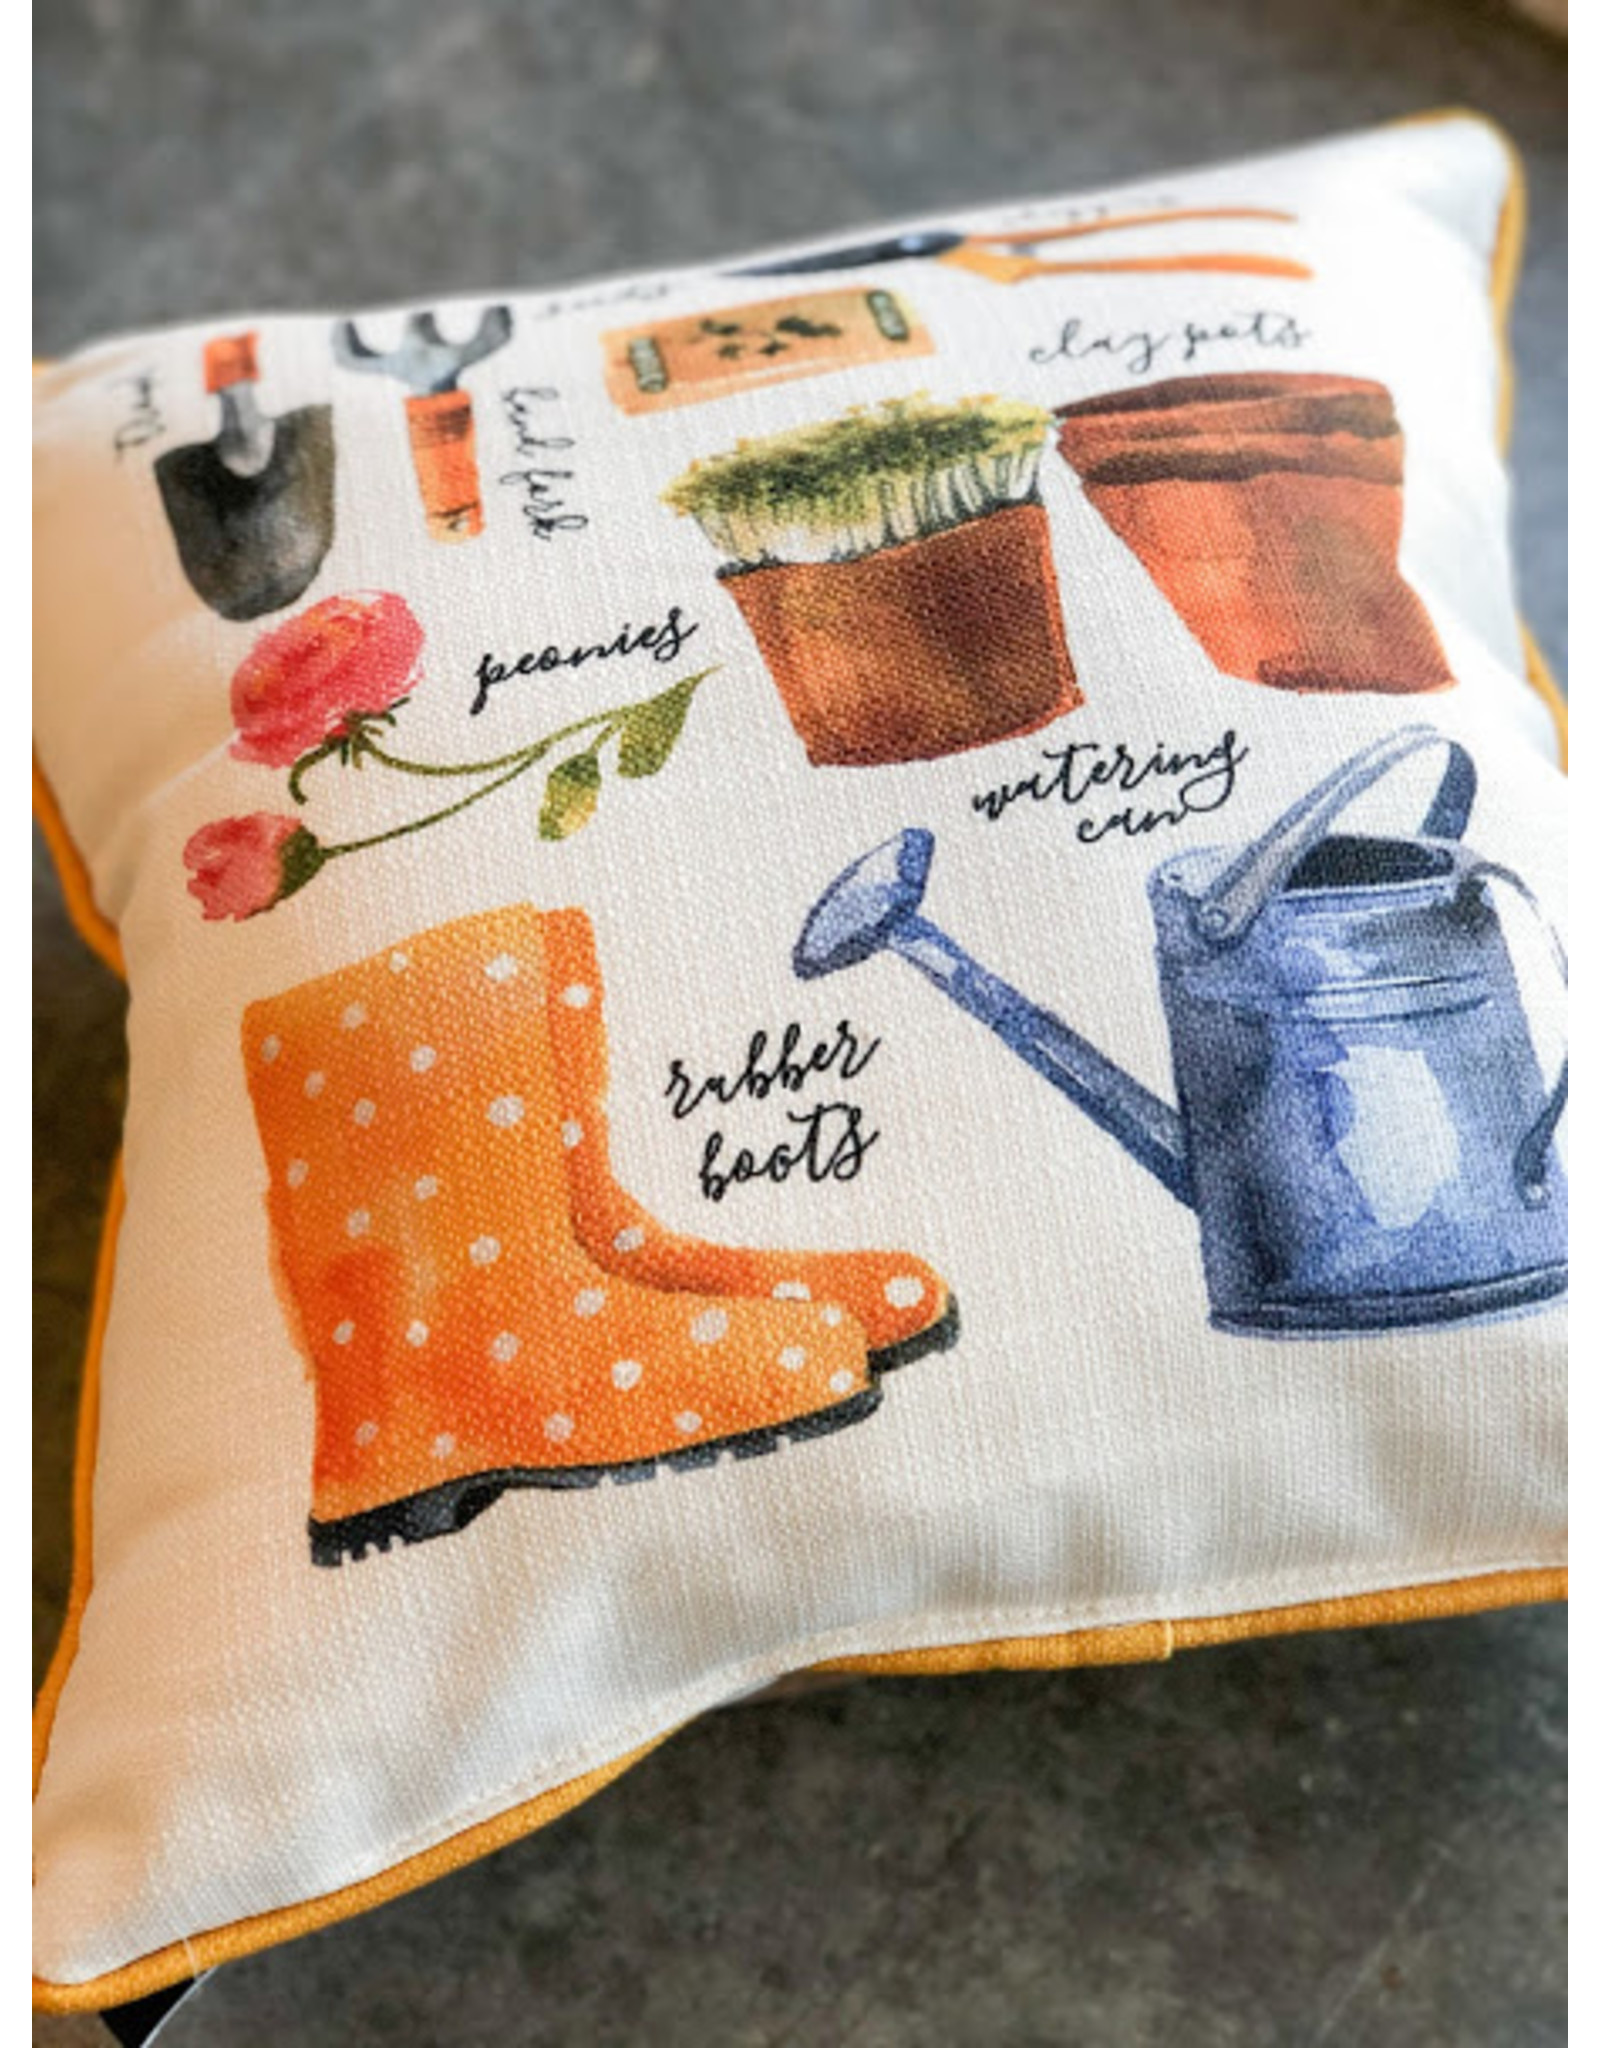 Little Birdie Assorted Garden Tools Piped Pillow